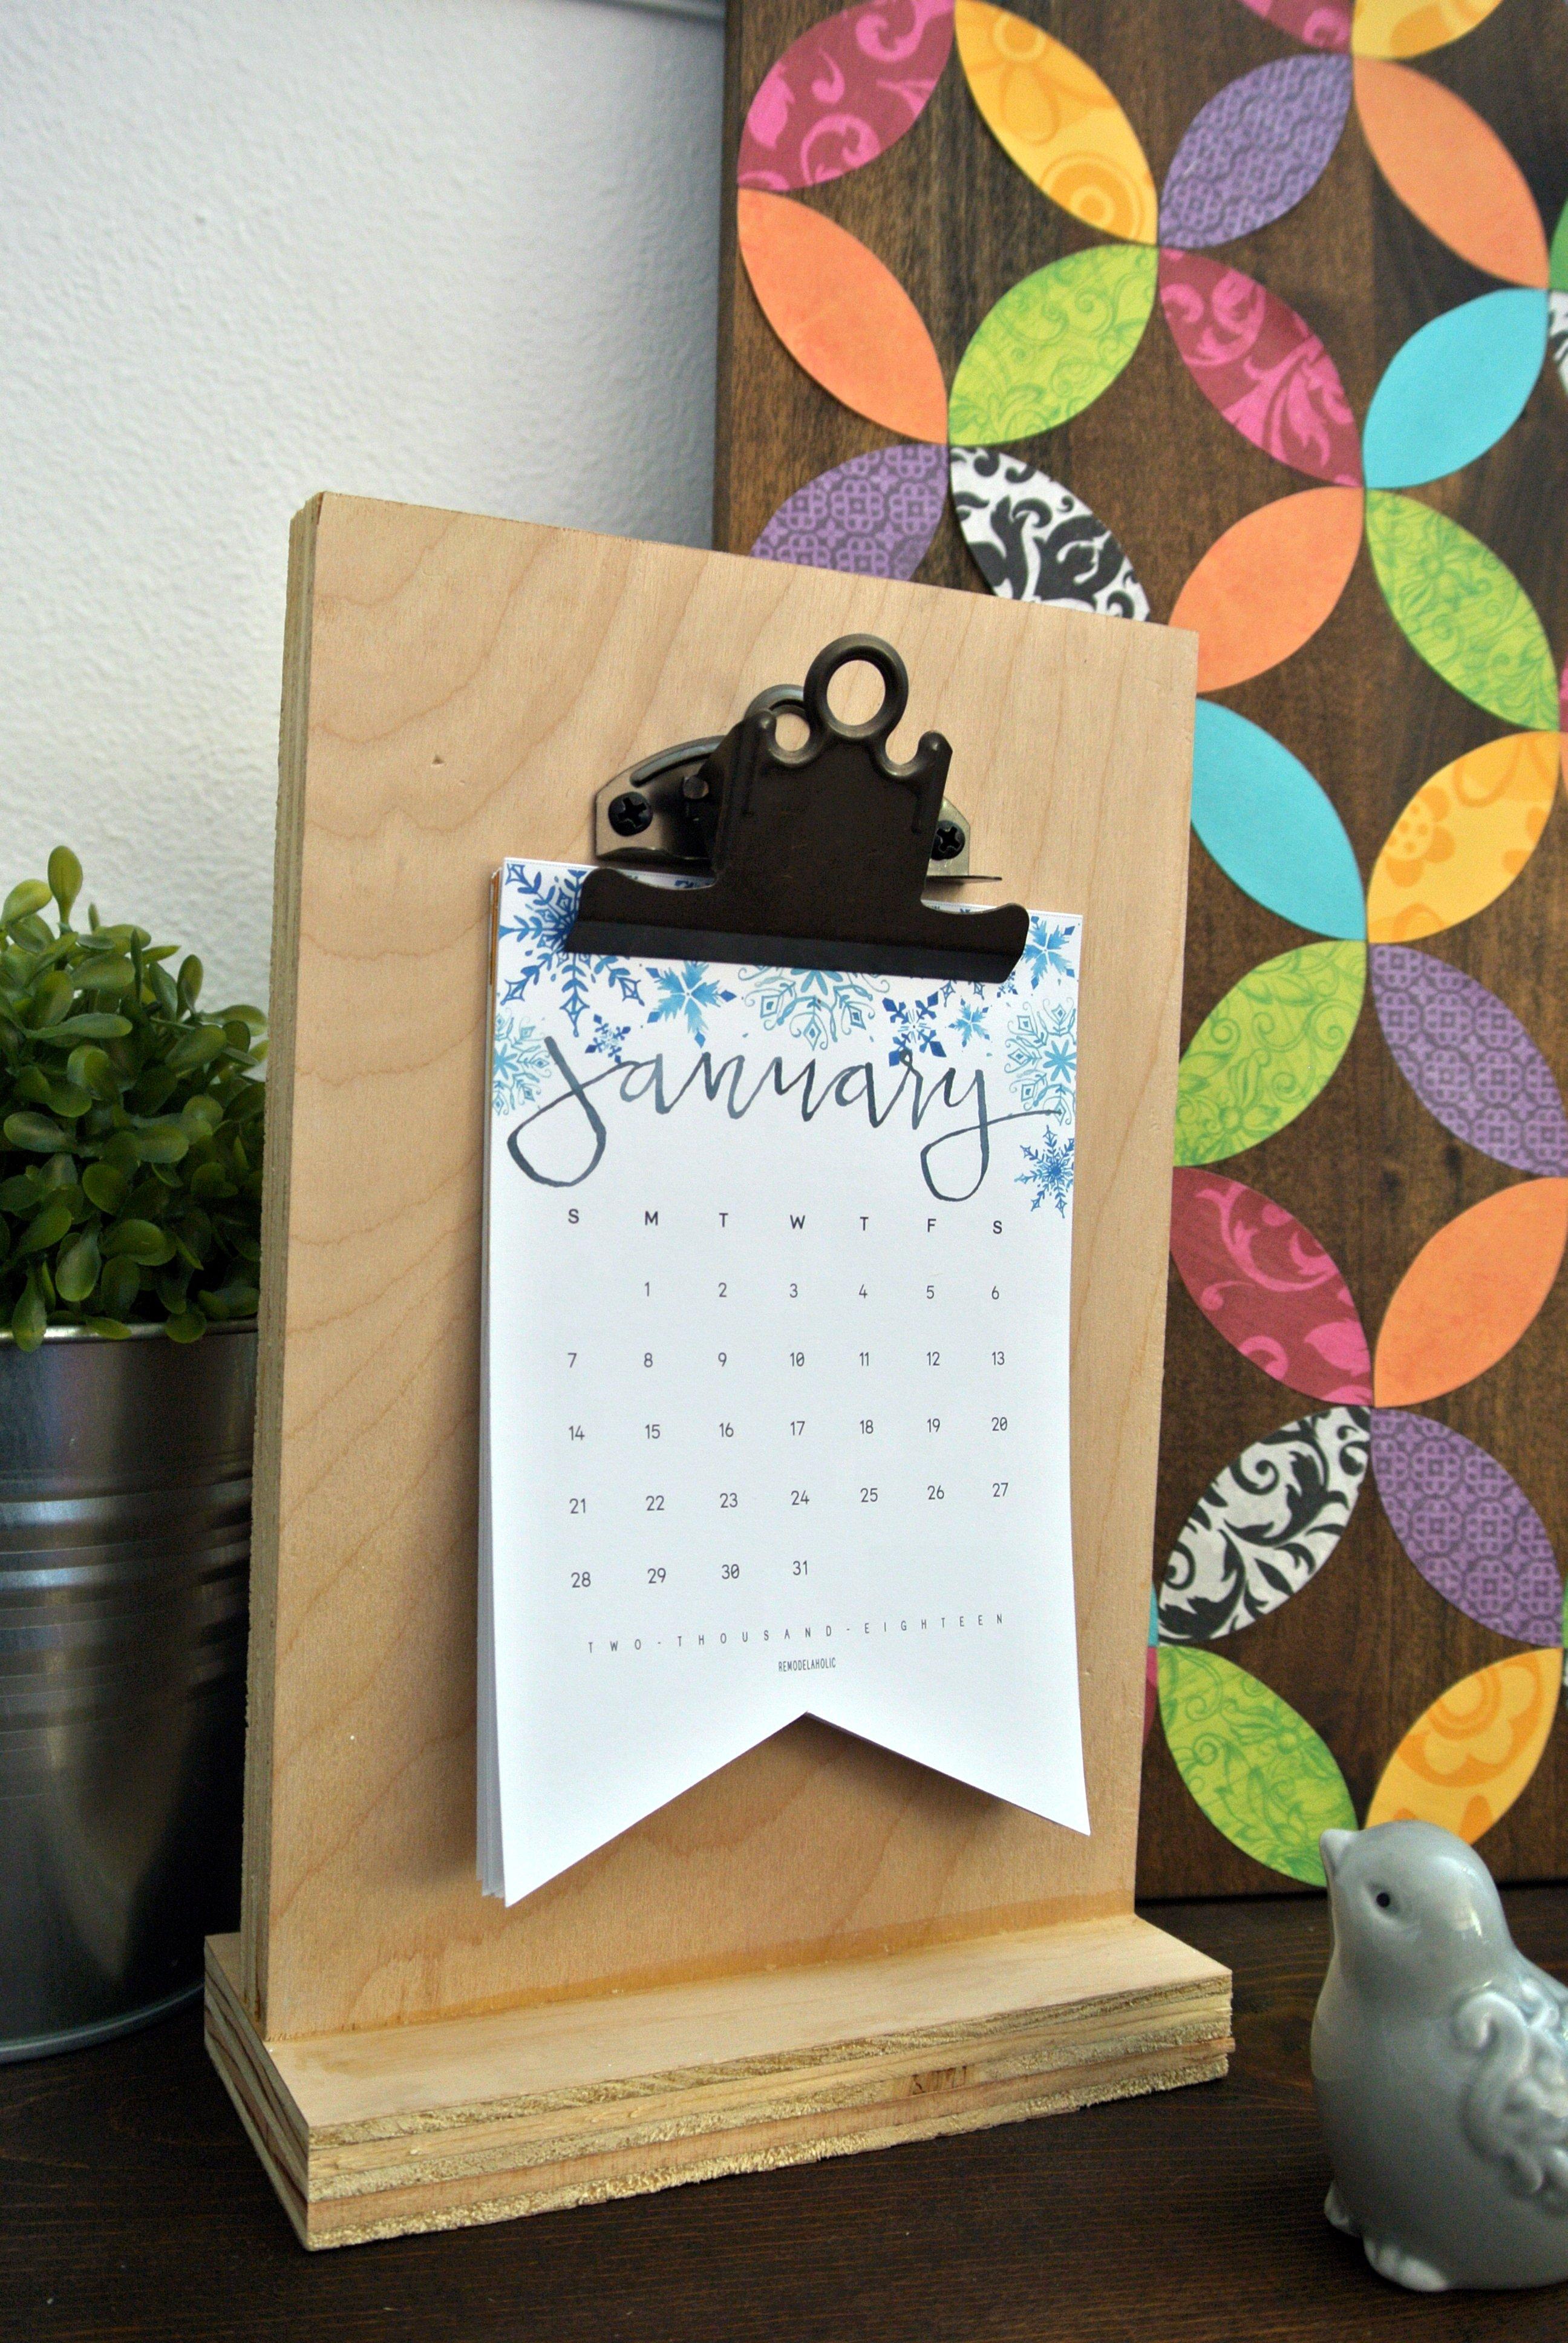 Diy Table Calendar Ideas : Remodelaholic last minute free printable gift ideas